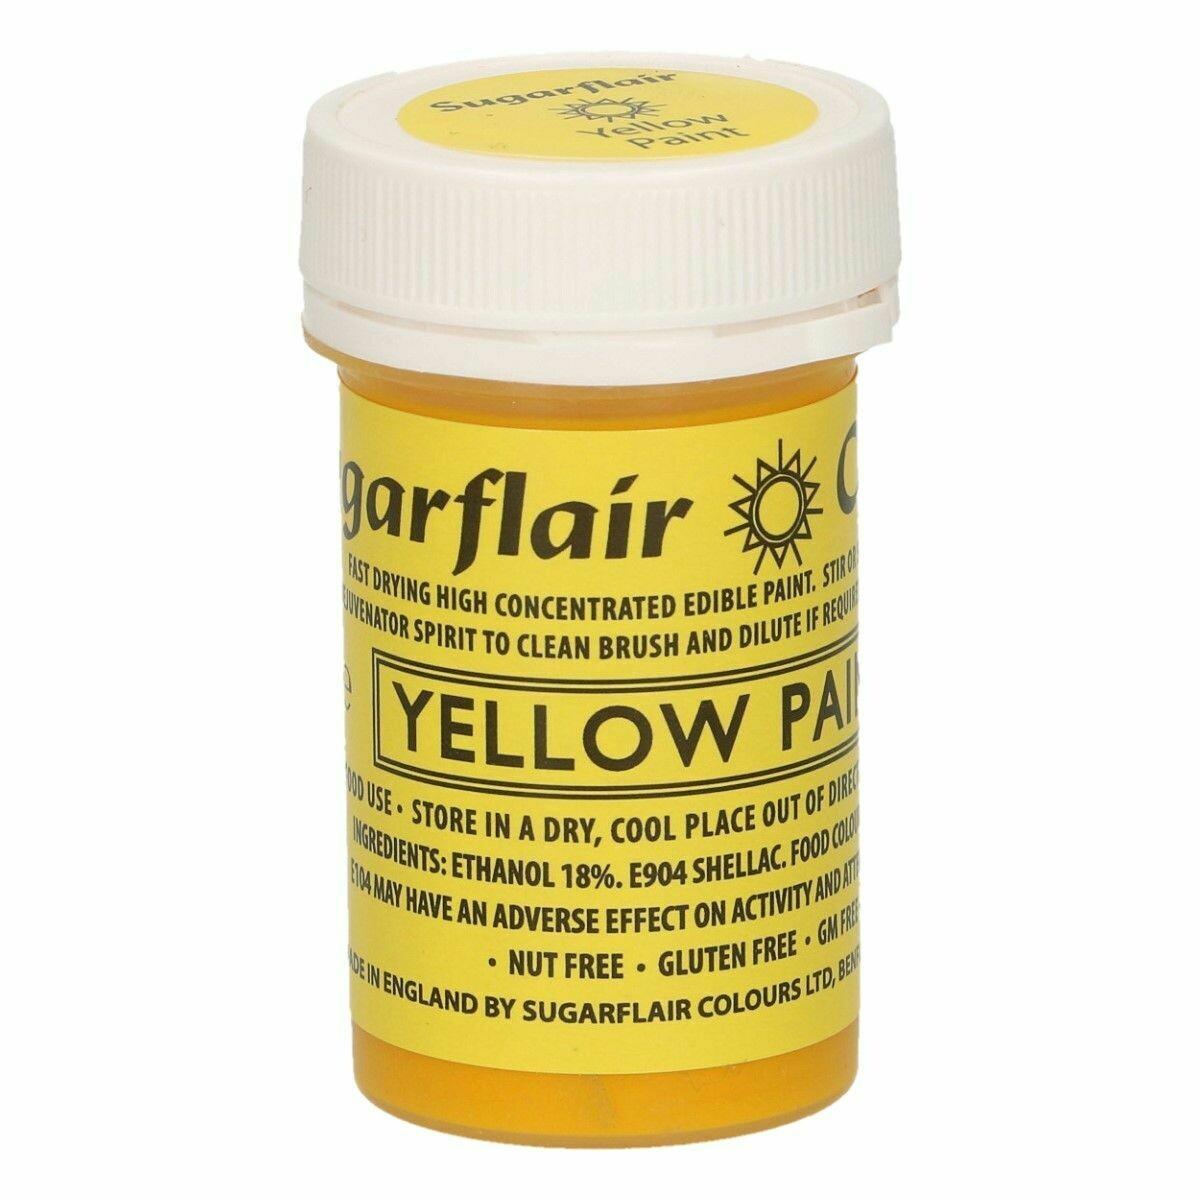 Sugarflair Matt Food Paints -YELLOW -Ματ Βρώσιμο Χρώμα Ζωγραφικής -Κίτρινο 20γρ